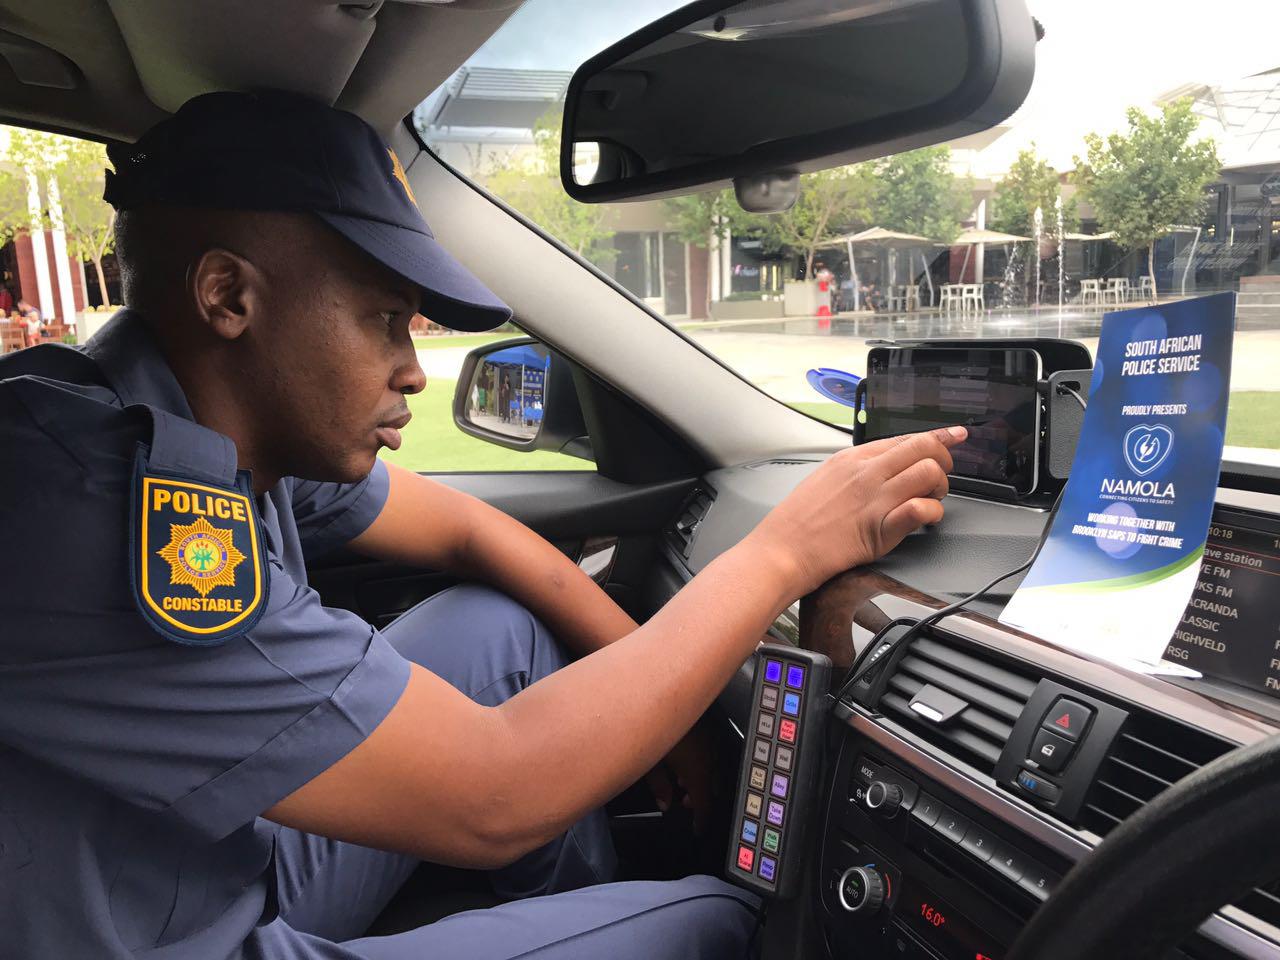 Image: Officer using responder unit